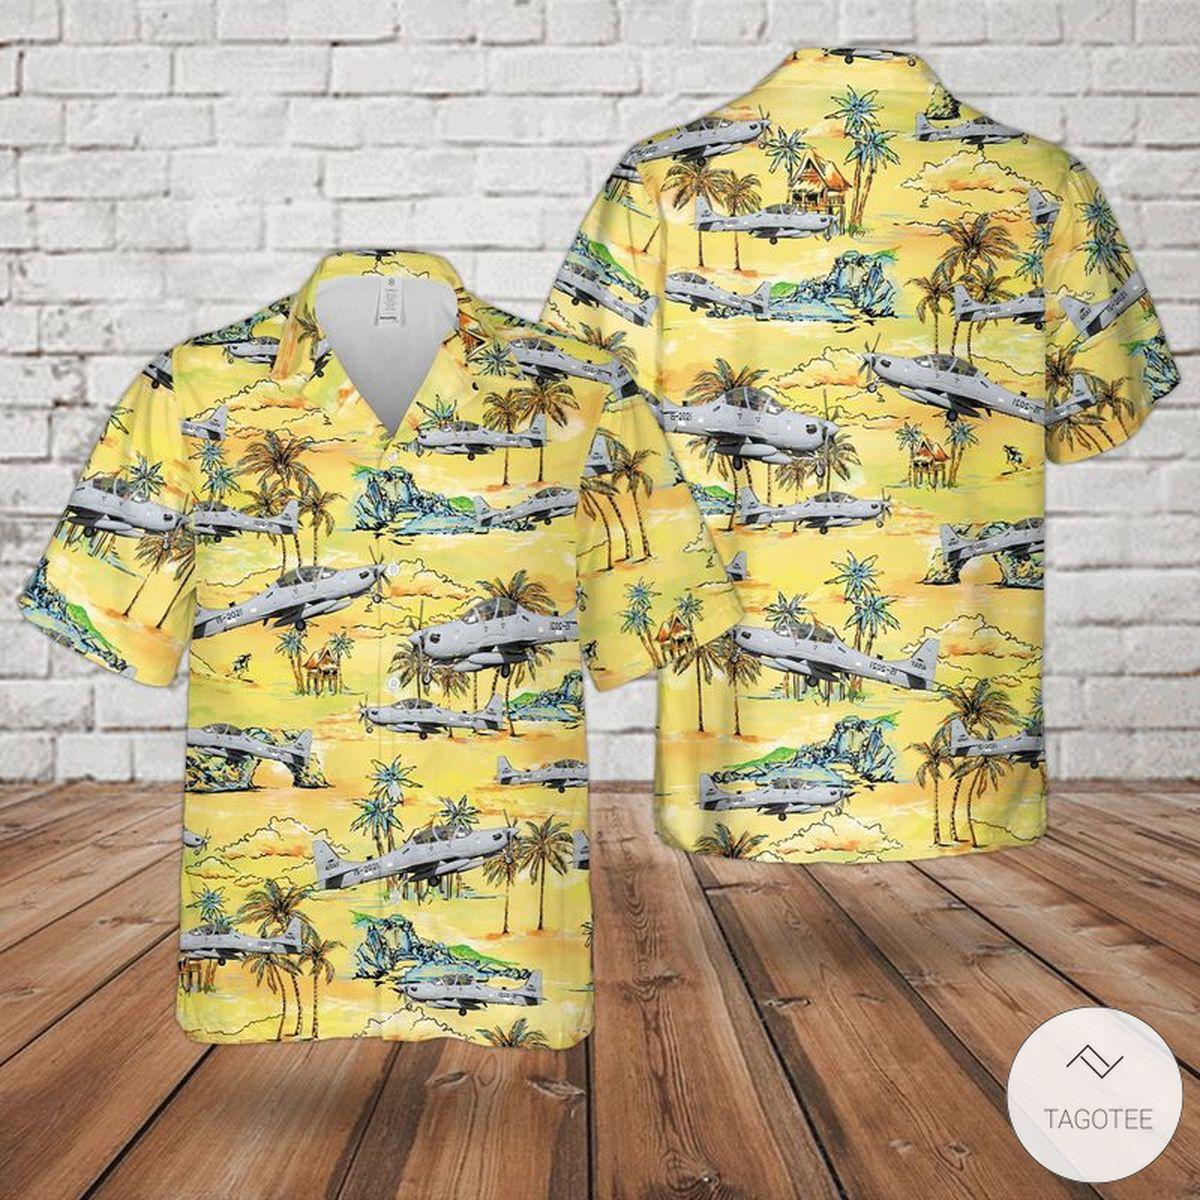 Us Air Force Embraer A-29 Super Tucano Hawaiian Shirt, Beach Shorts